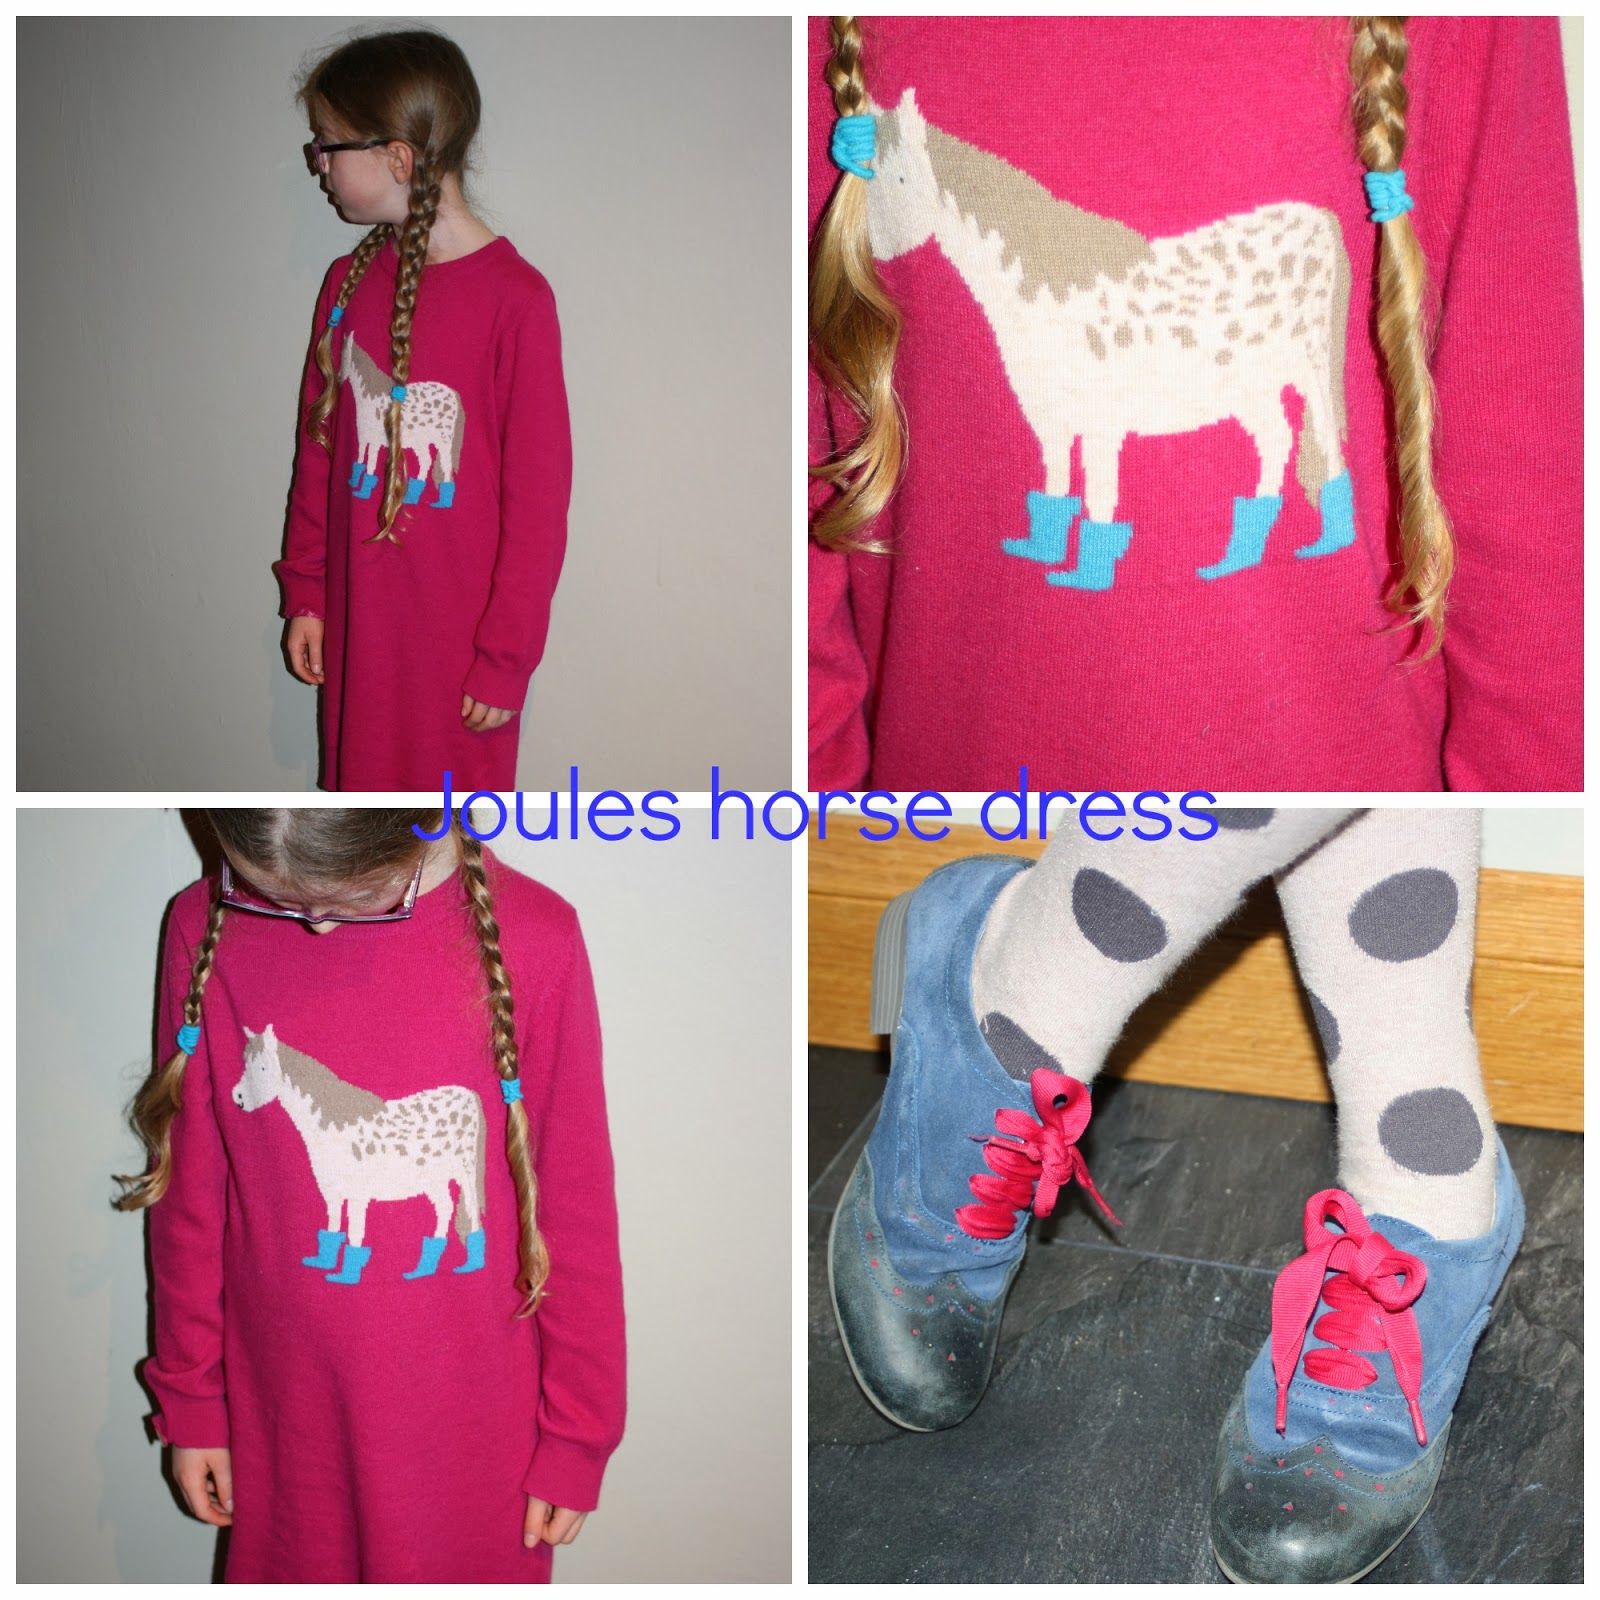 Joules-jumper-dress-daughter-fashion-girls